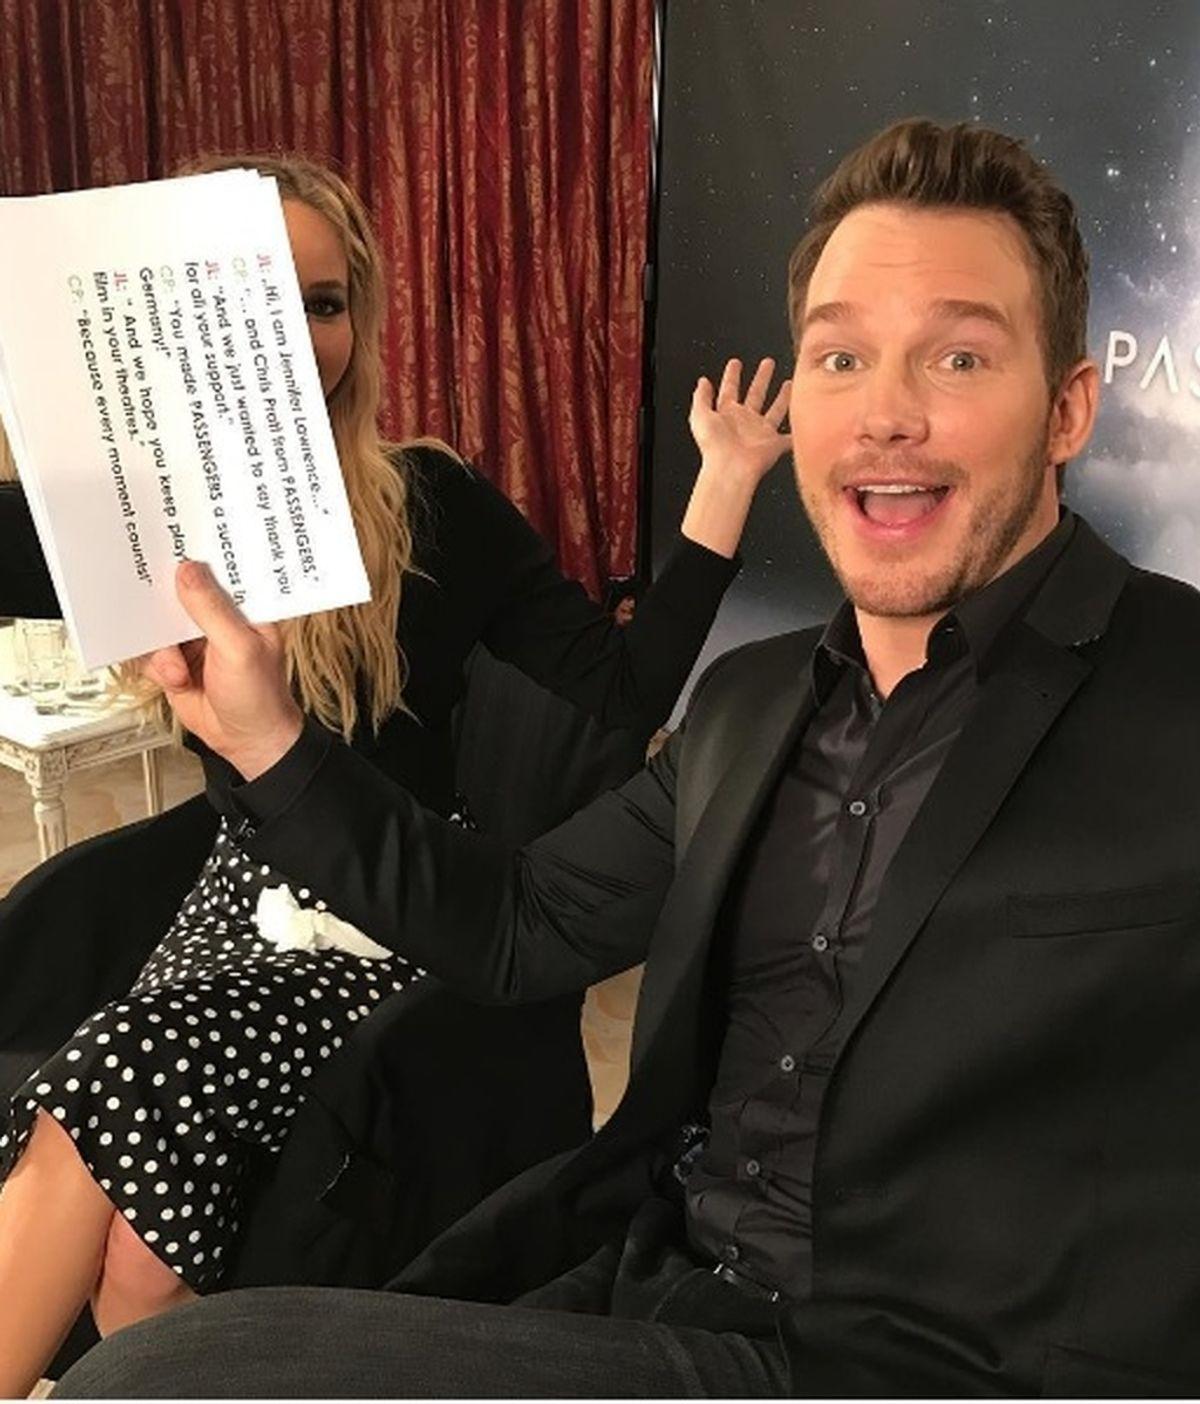 La divertida broma de Chris Pratt a Jennifer Lawrence: la recorta en todas las fotos